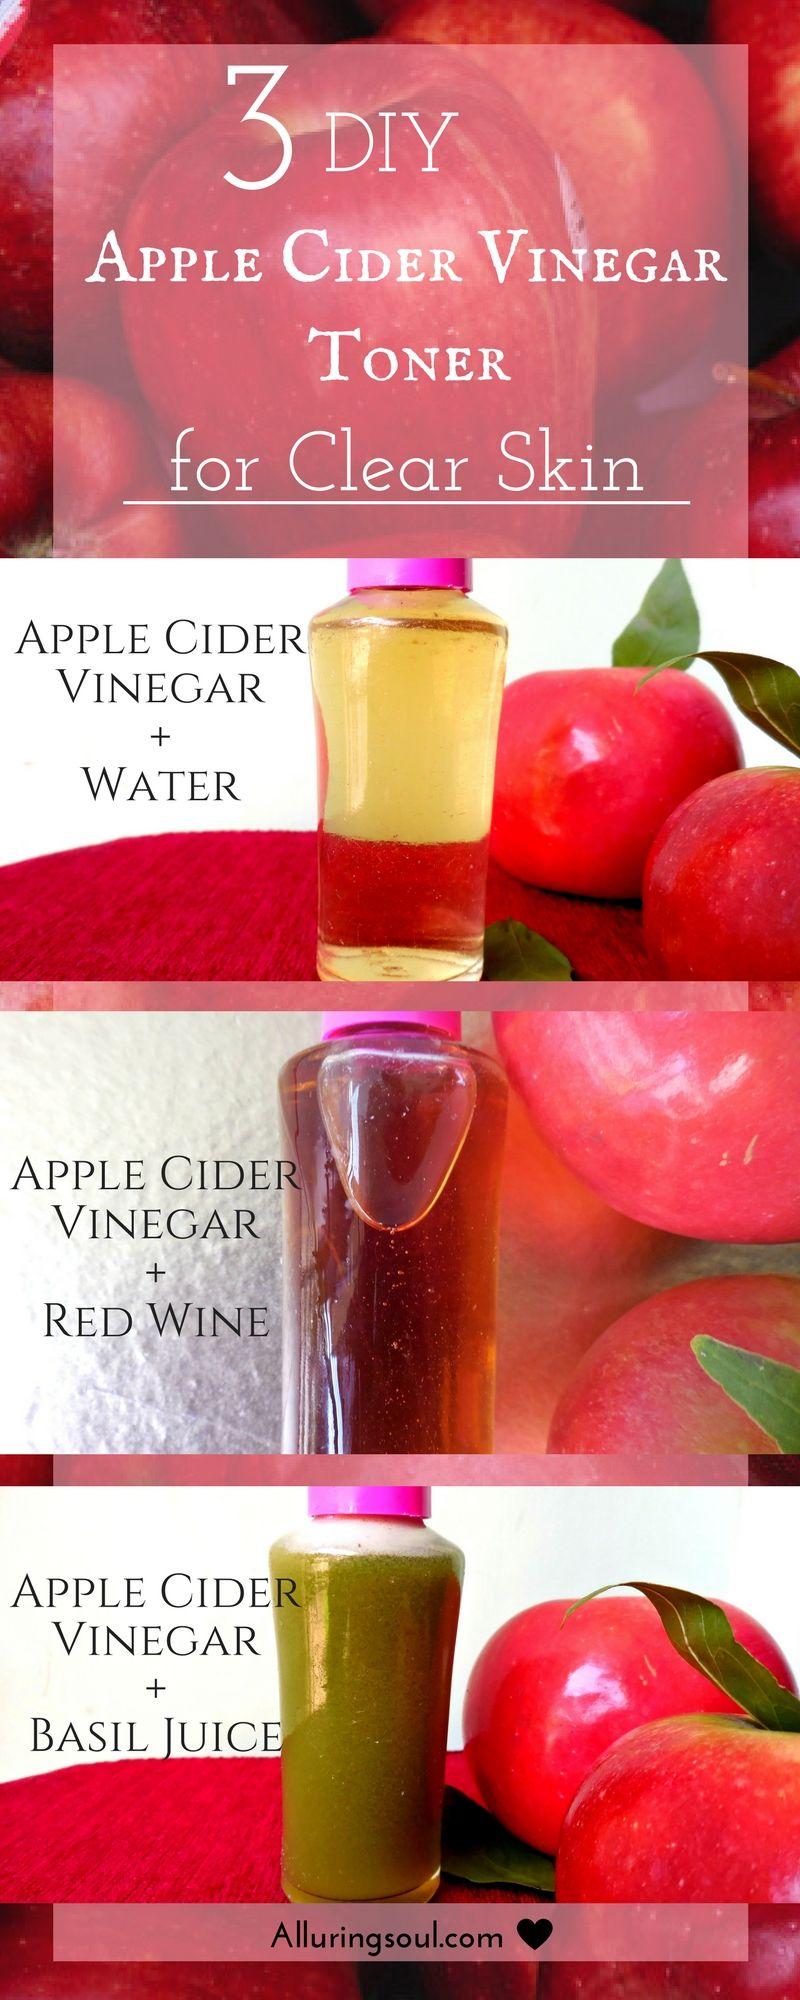 Get Glowing With A Basic Korean Skin Care Routine With Images Apple Cider Vinegar Toner Apple Cider Vinegar For Skin